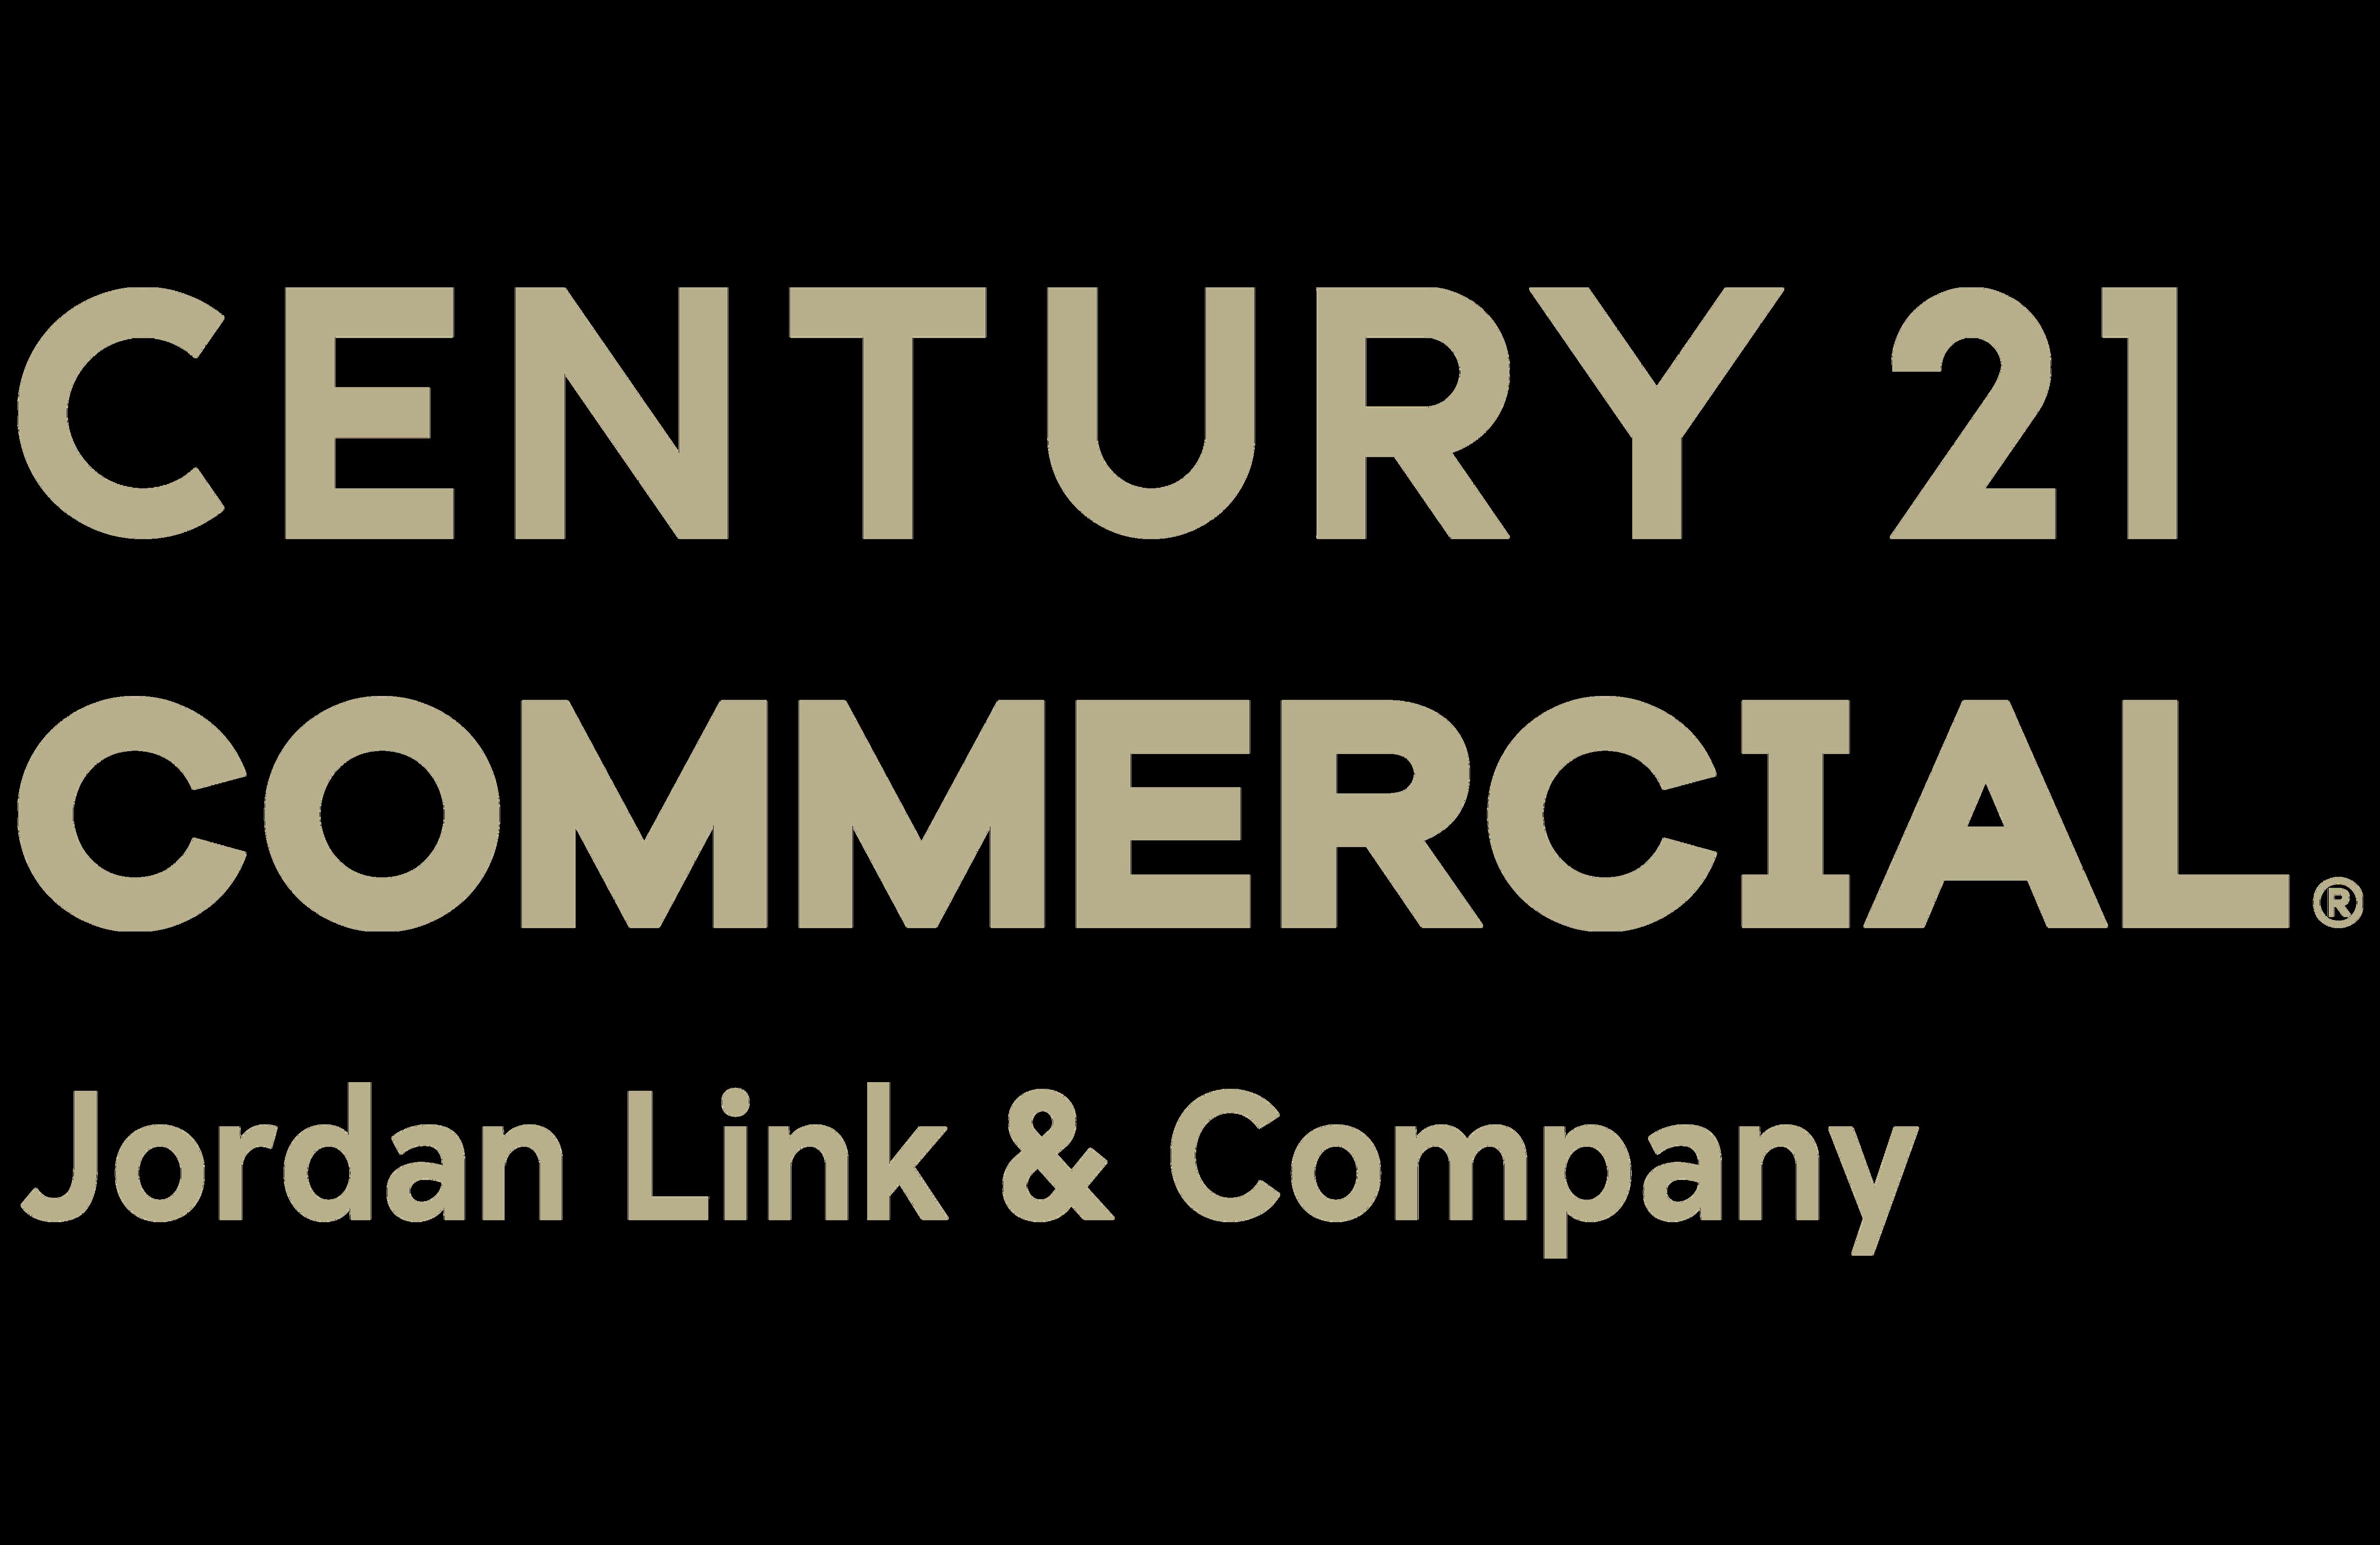 CENTURY 21 Jordan Link & Company